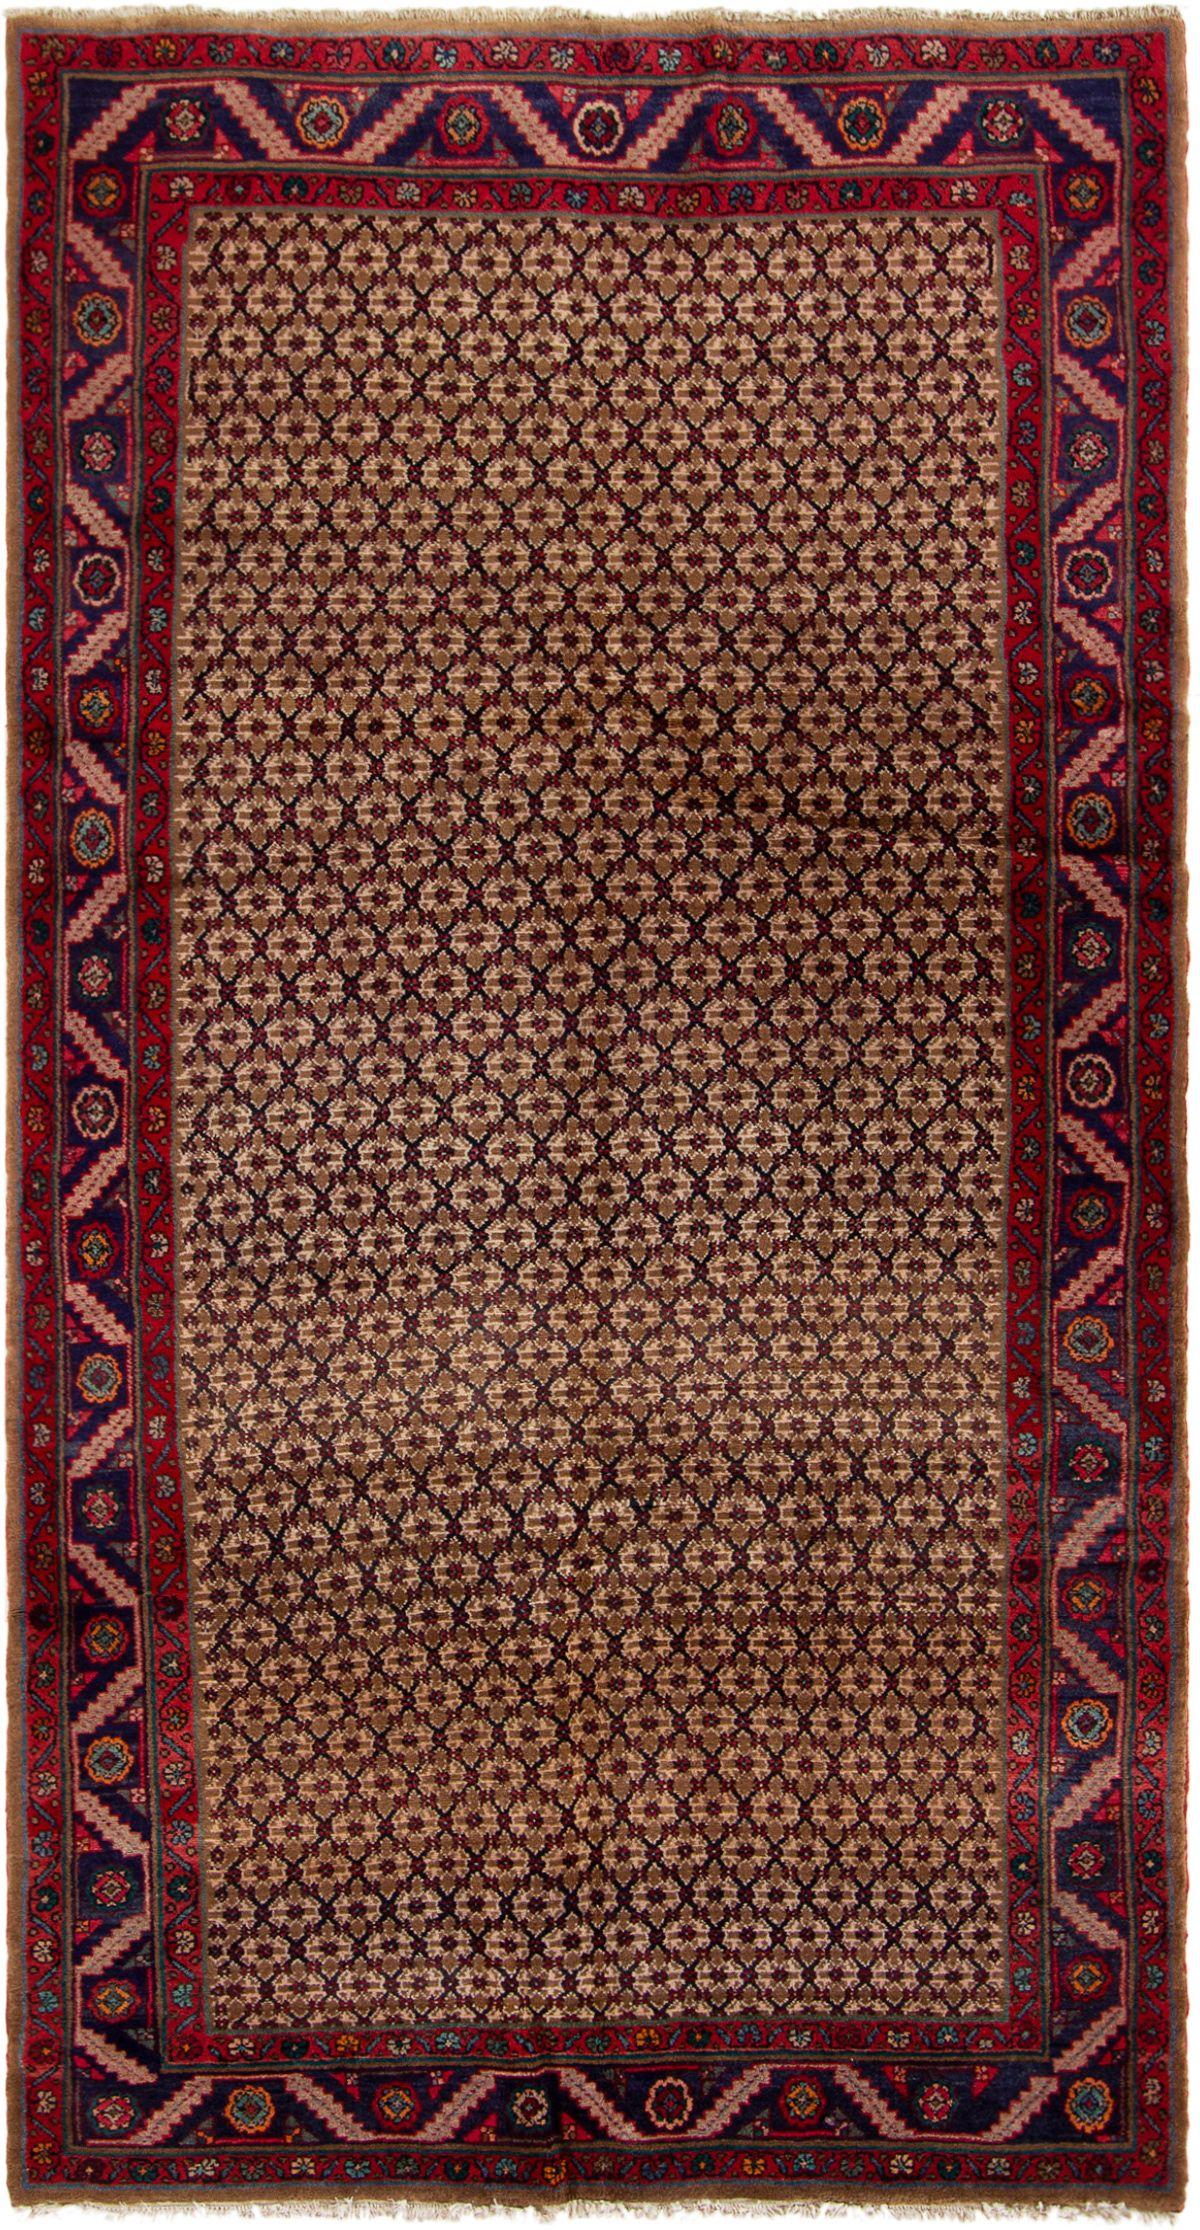 "Hand-knotted Koliai  Wool Rug 5'0"" x 9'8"" Size: 5'0"" x 9'8"""